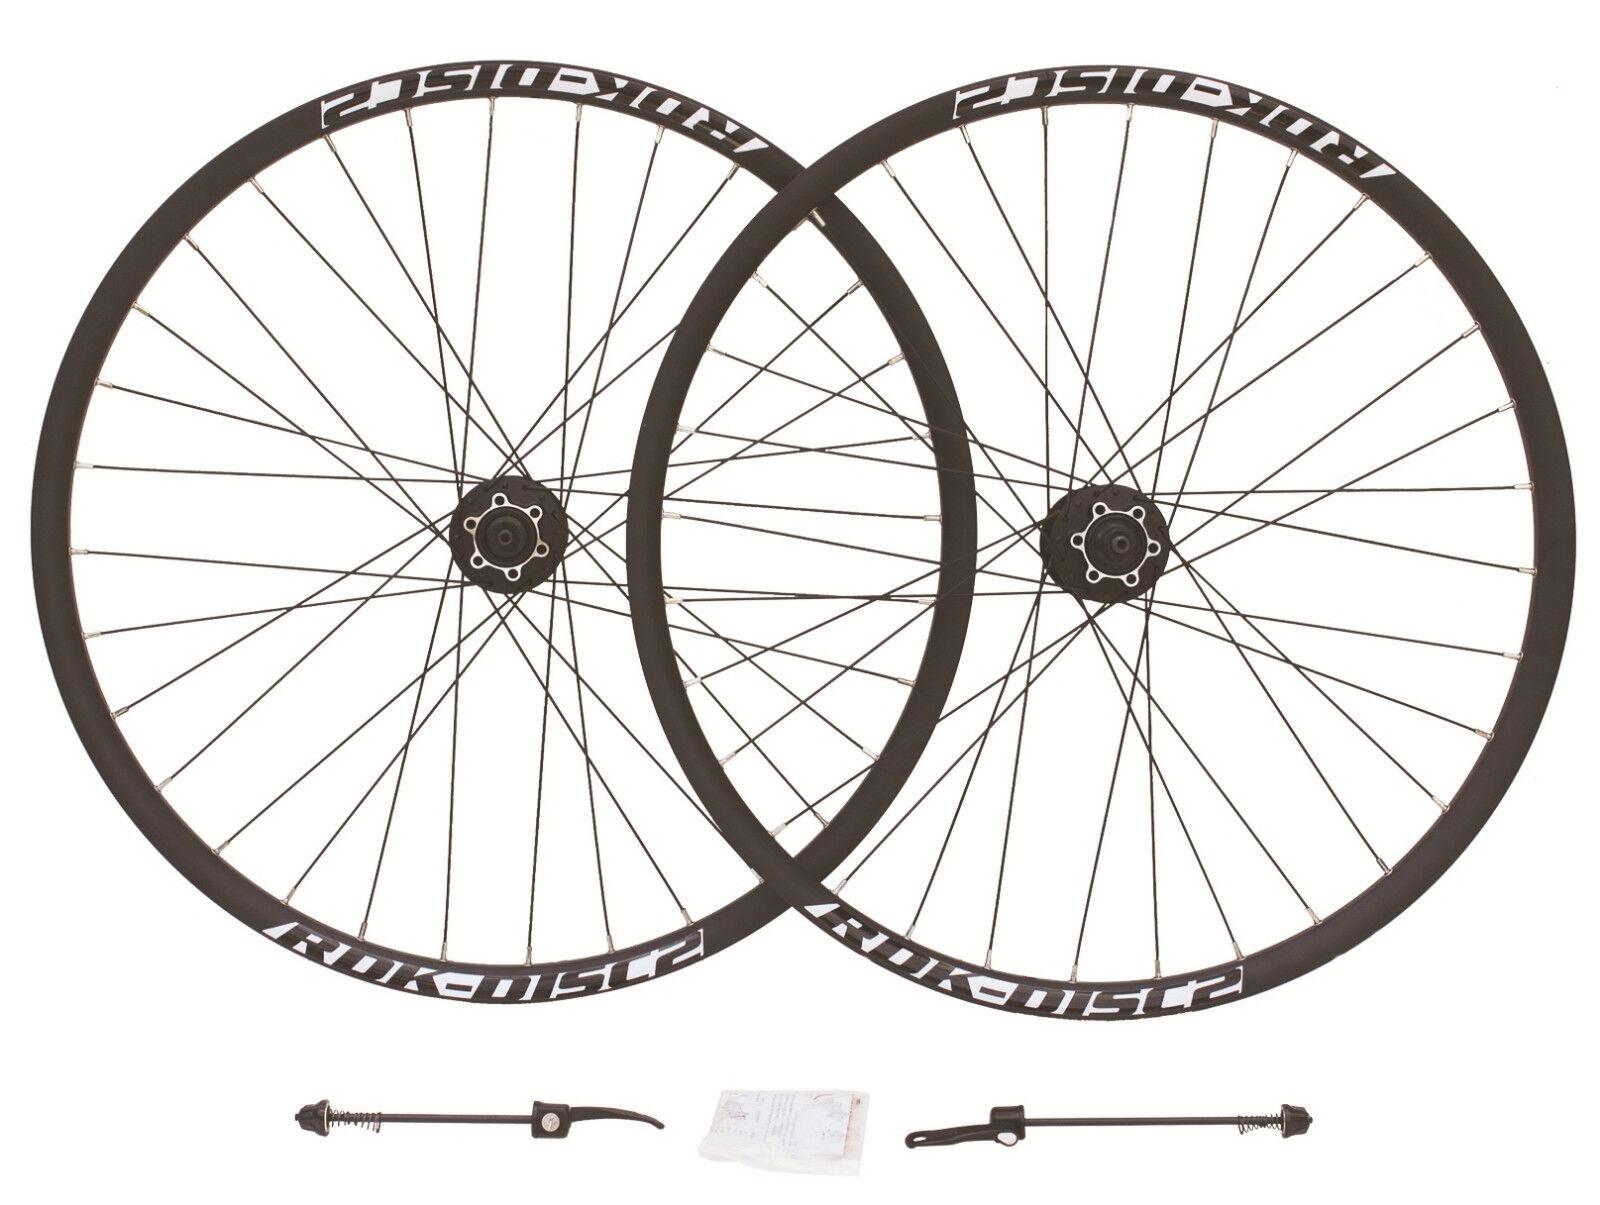 RDK DISC 2 Disc Wheels (PAIR) Shimano M525A Hubs 26  Mountain Bike 8 9 10 speed